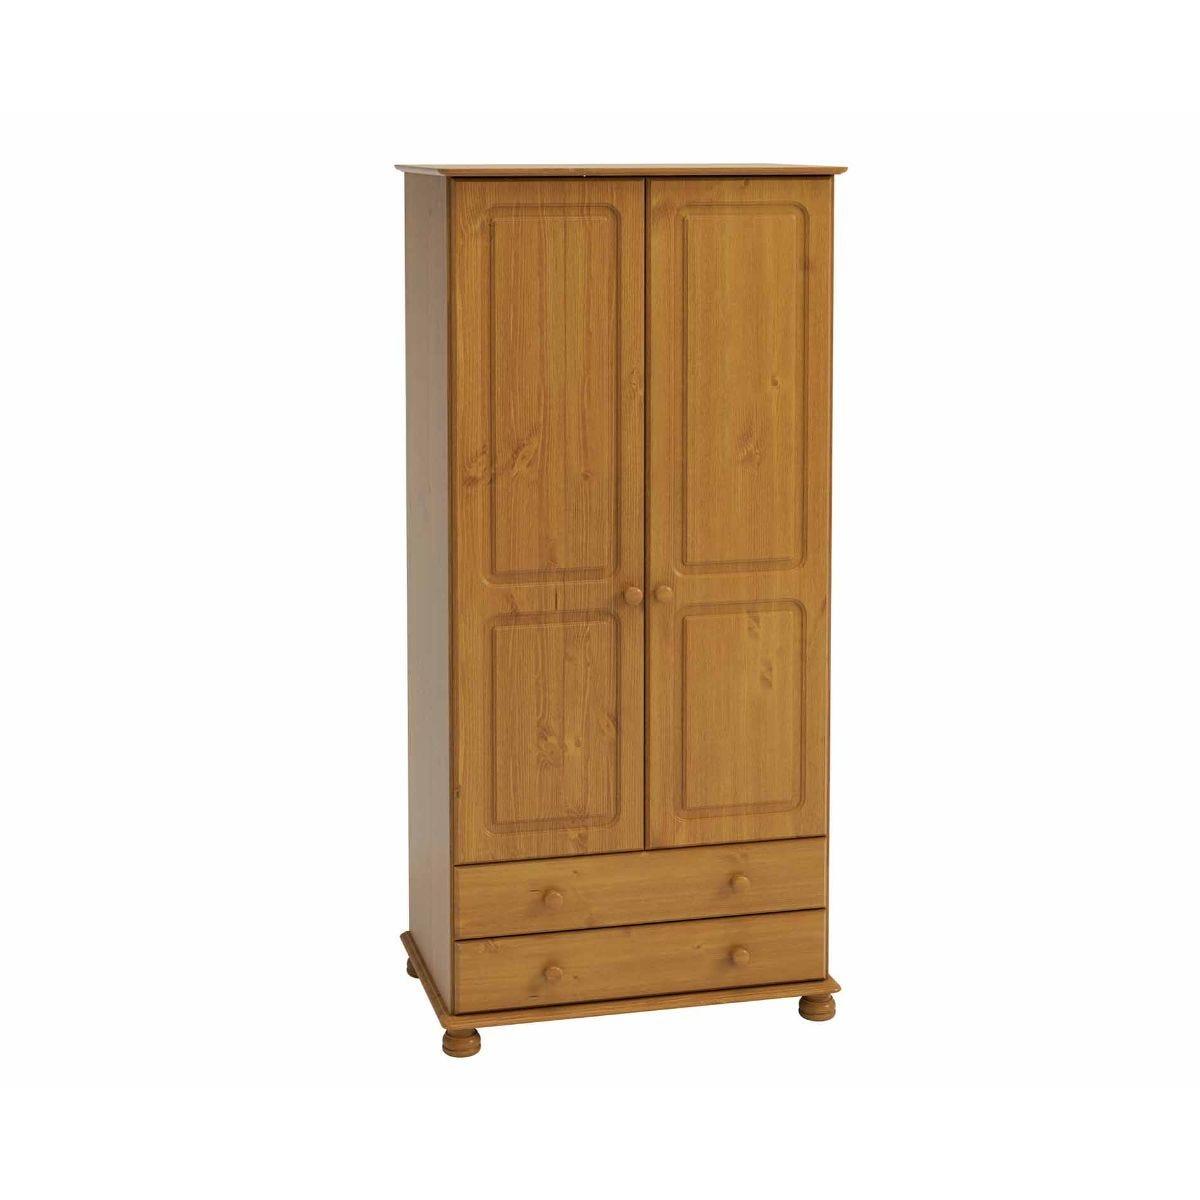 Steens Richmond 2 Door Over 2 Drawer Narrow Wardrobe, Pine